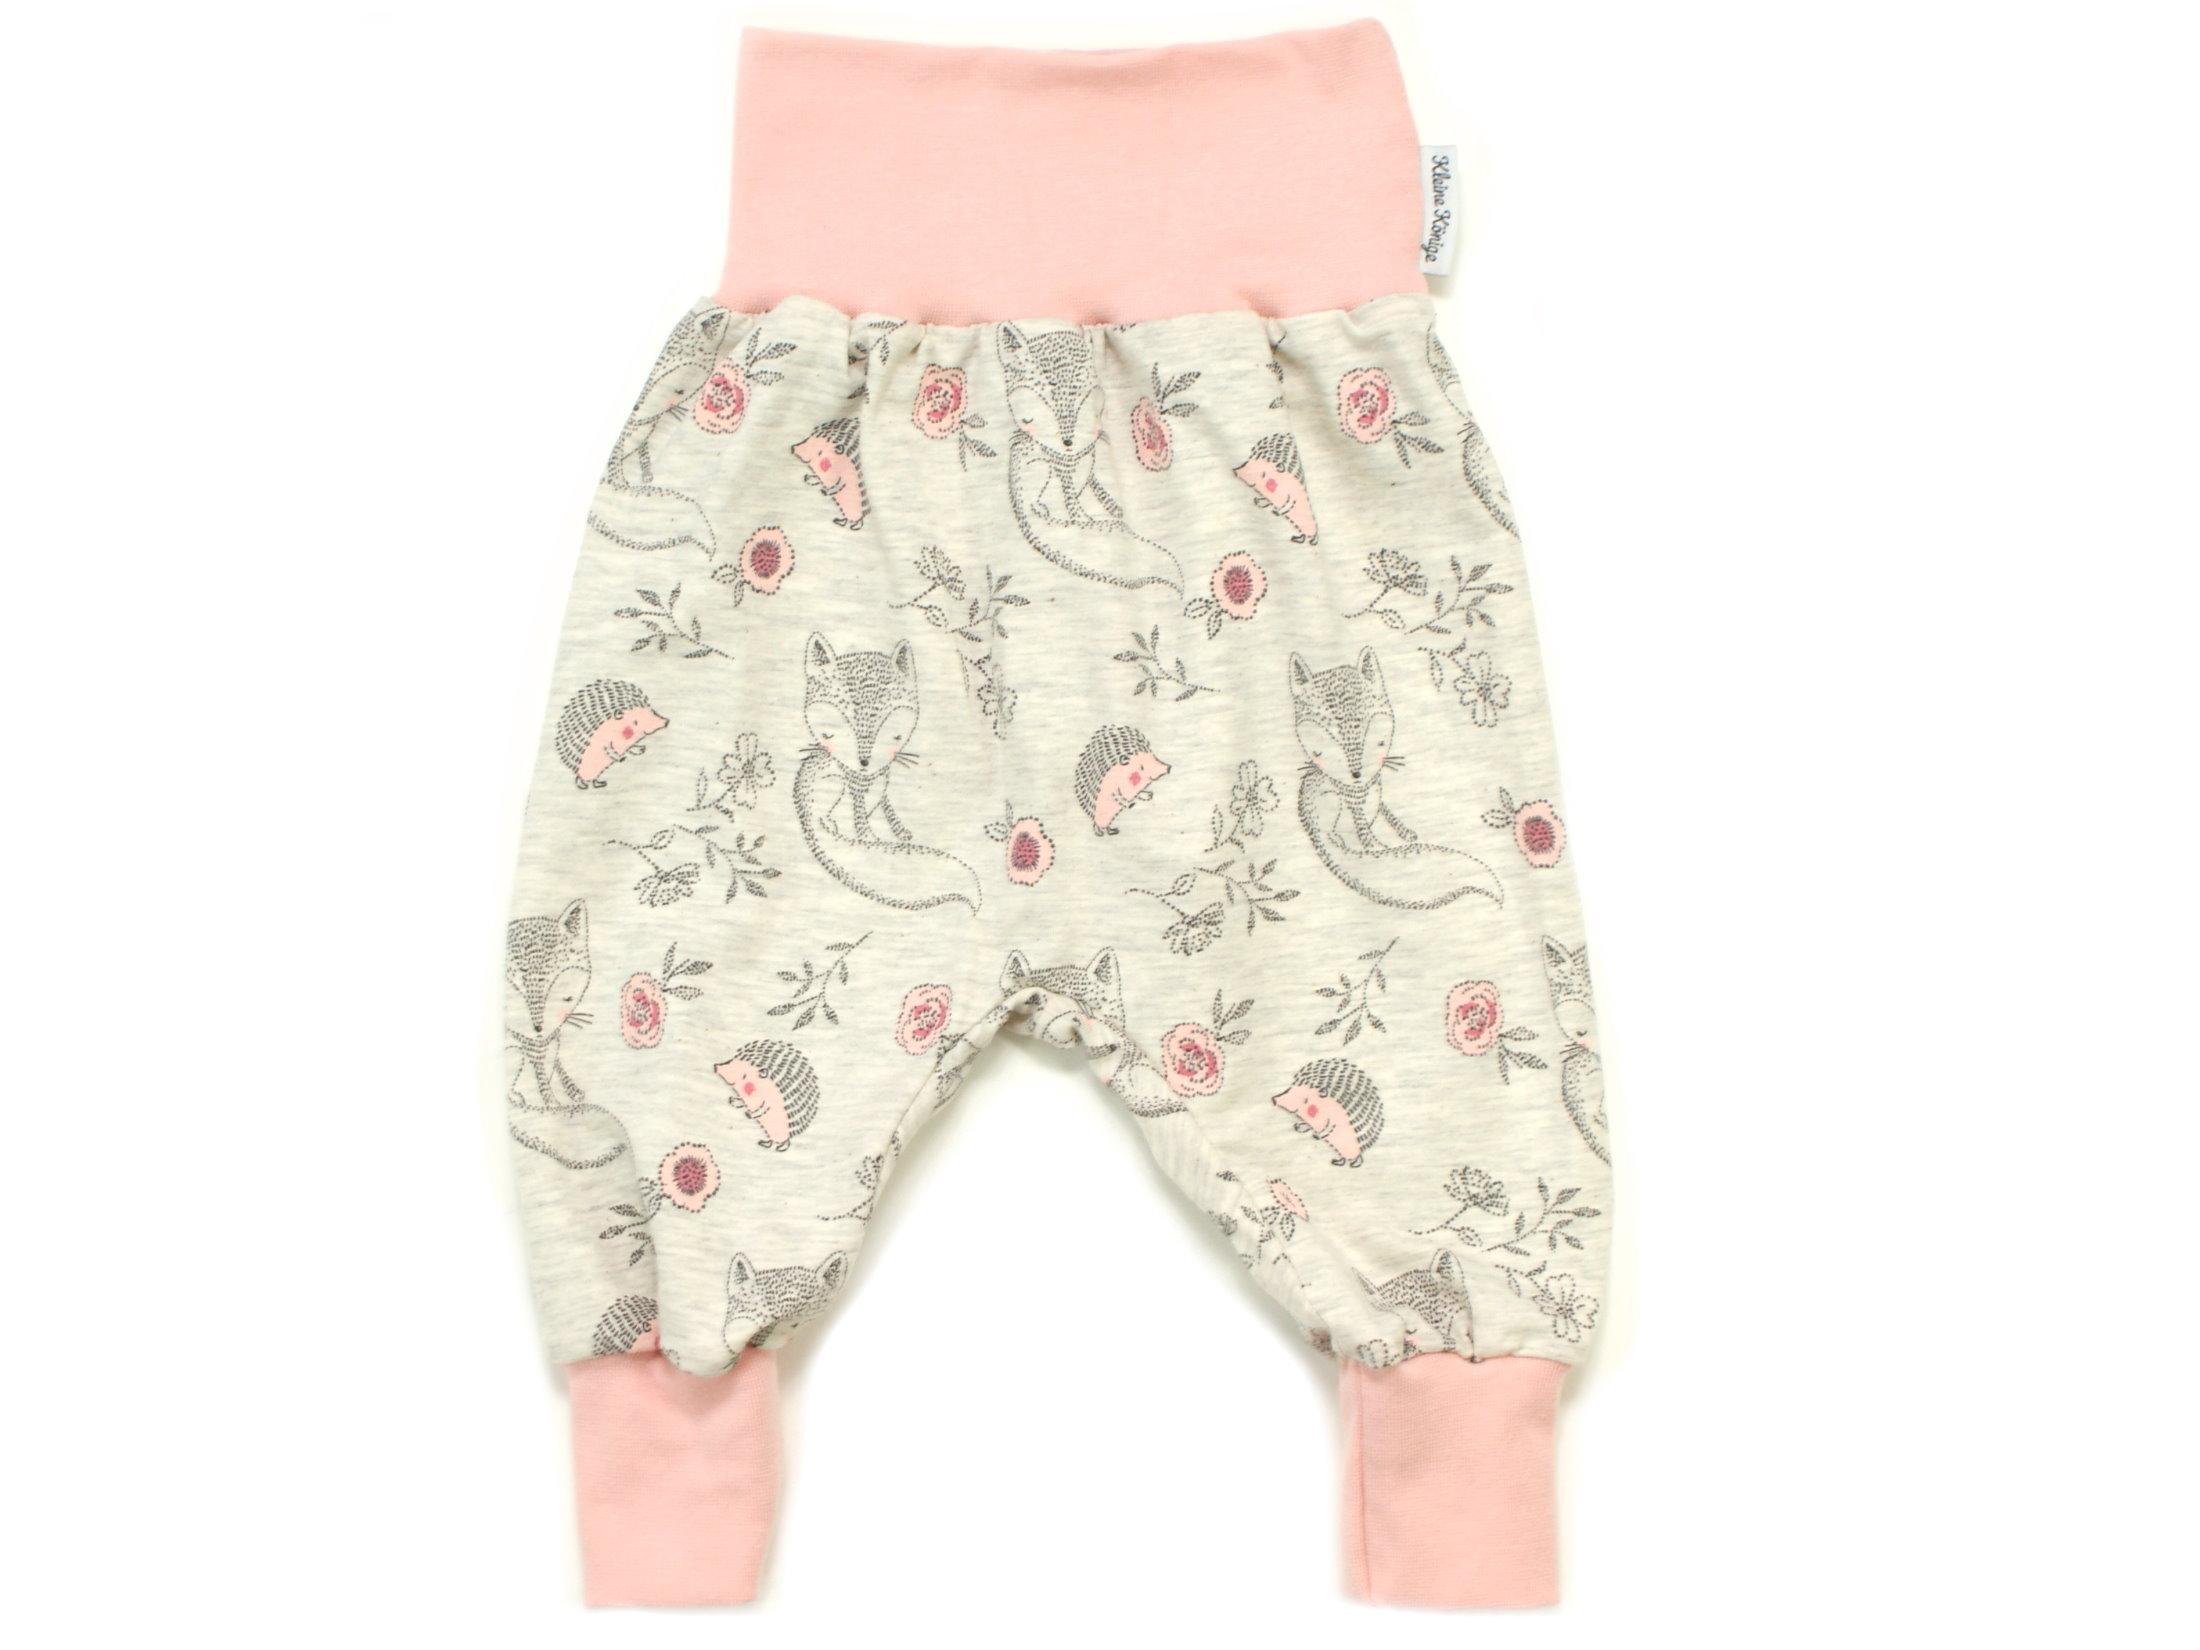 "Baby Pumphose Igel ""Cutie Pies"" beige rosé"